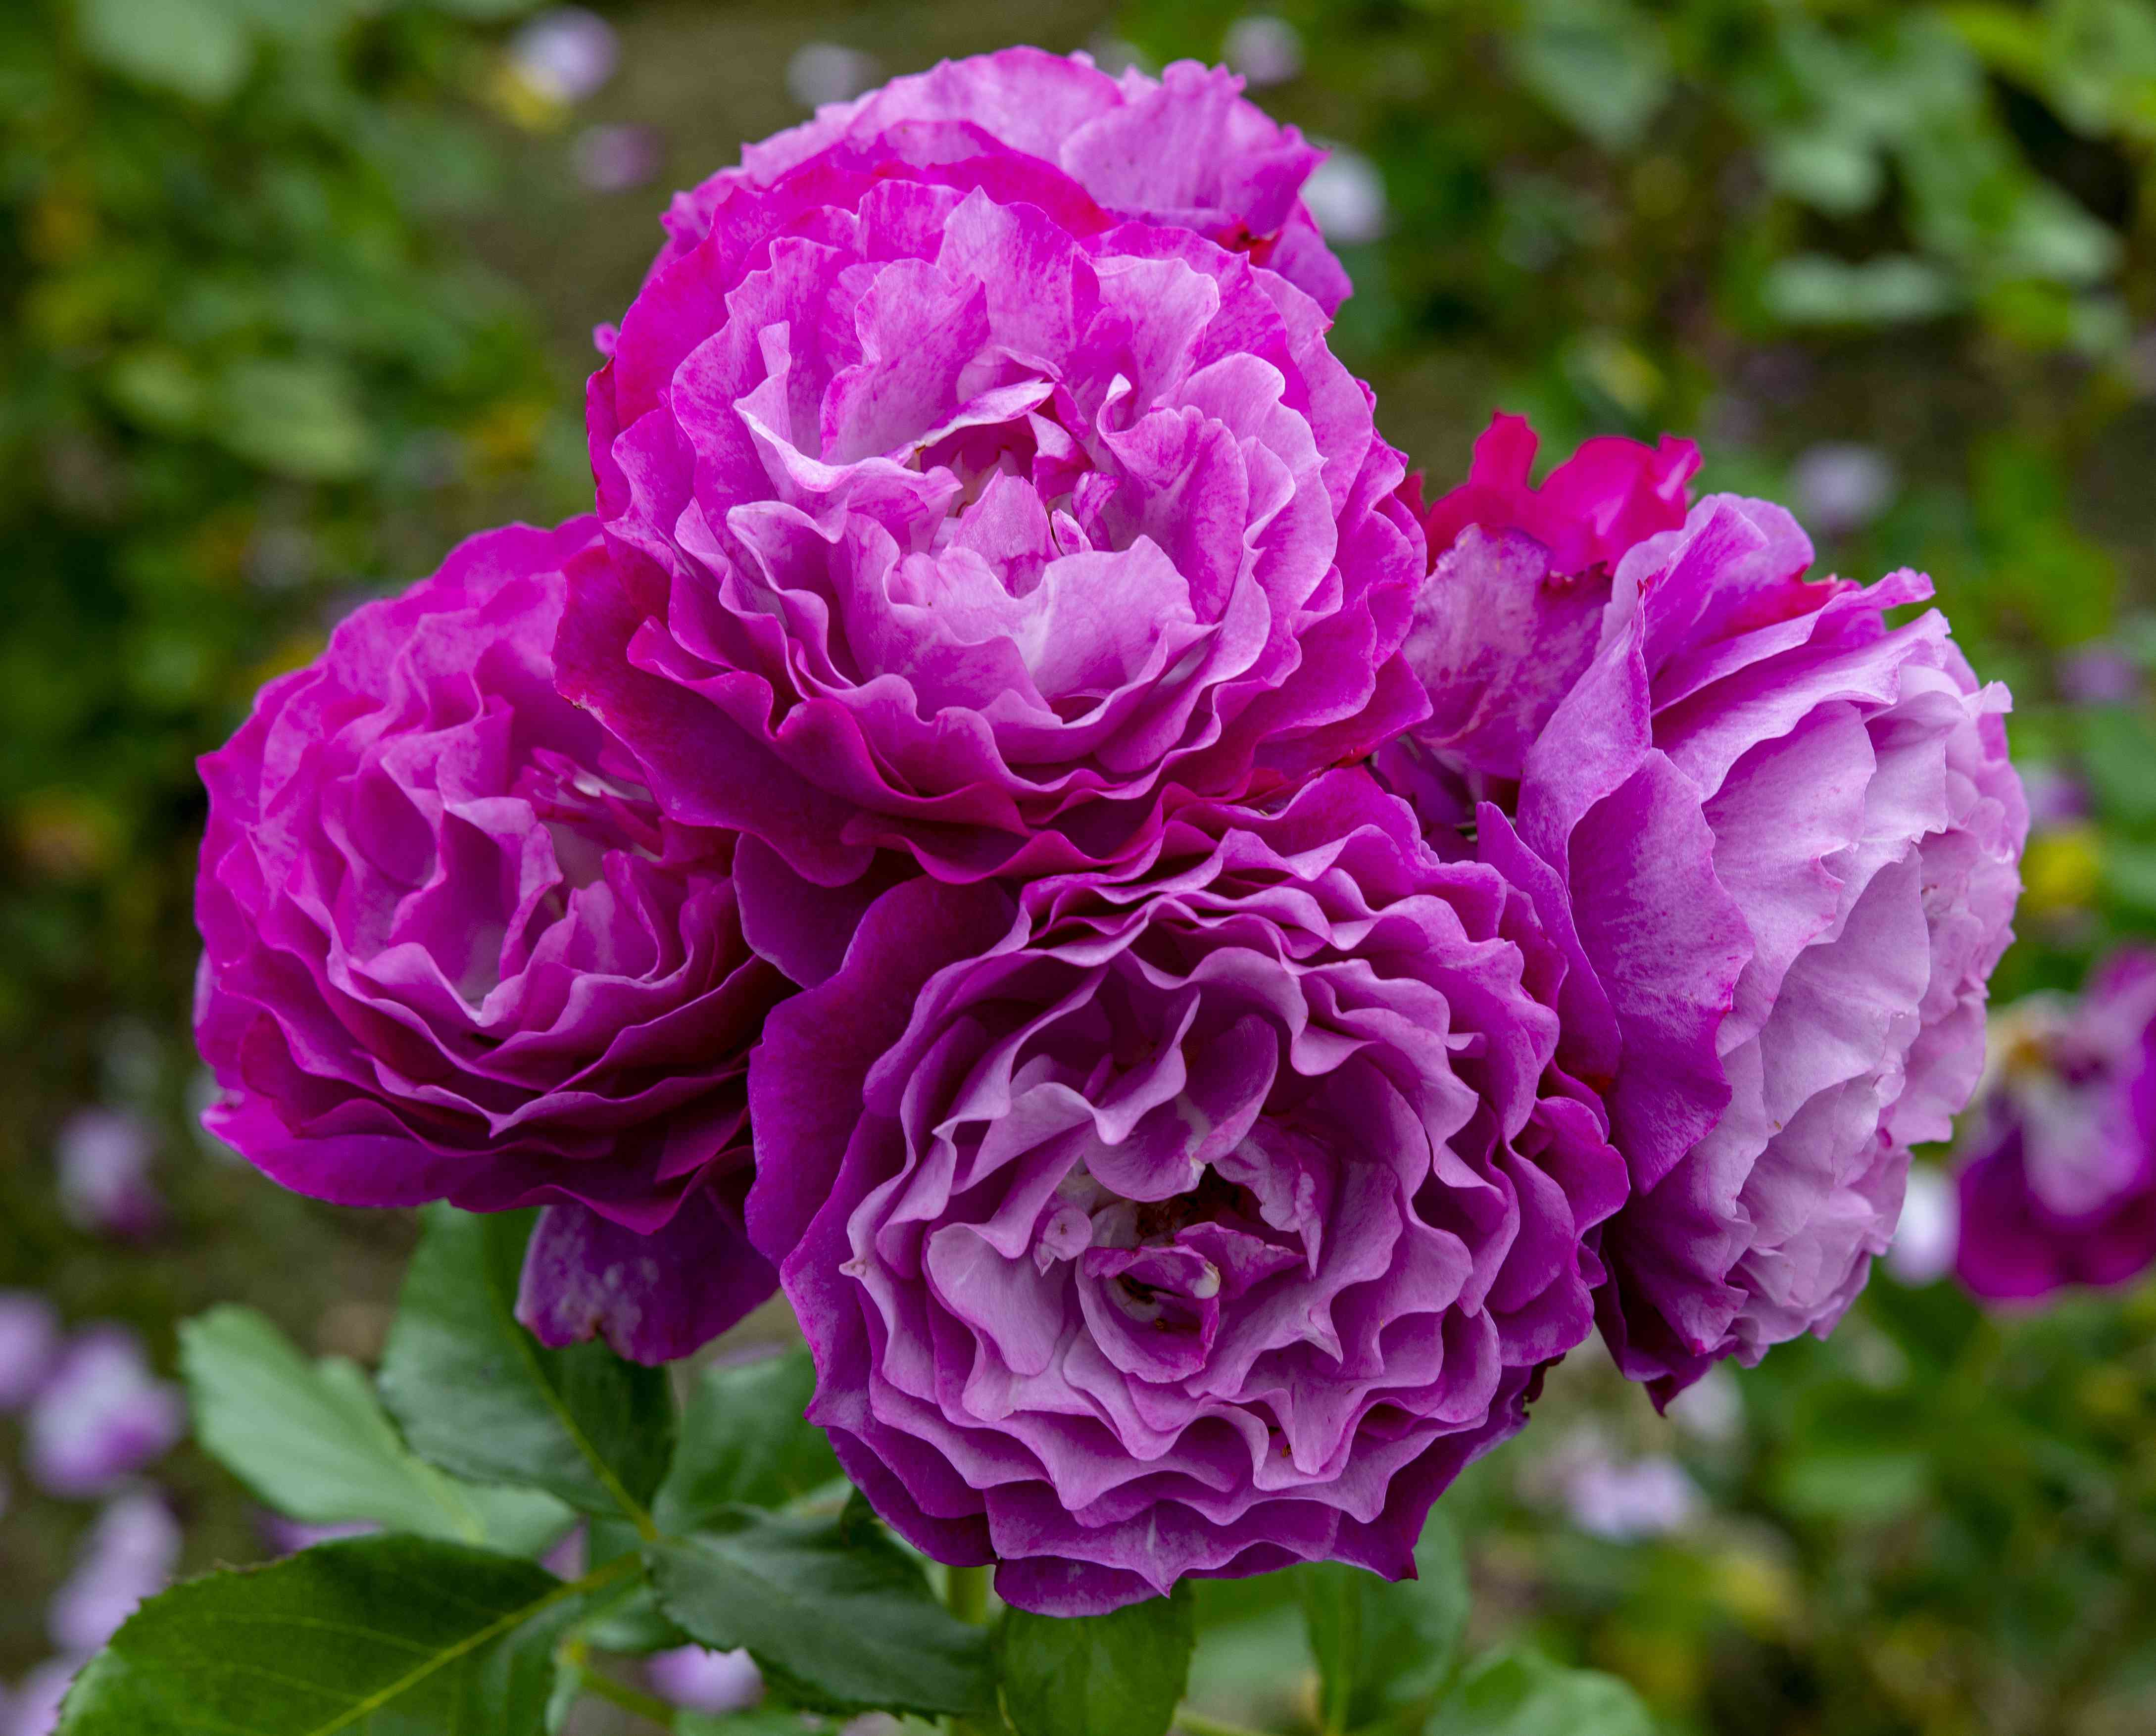 Different rose